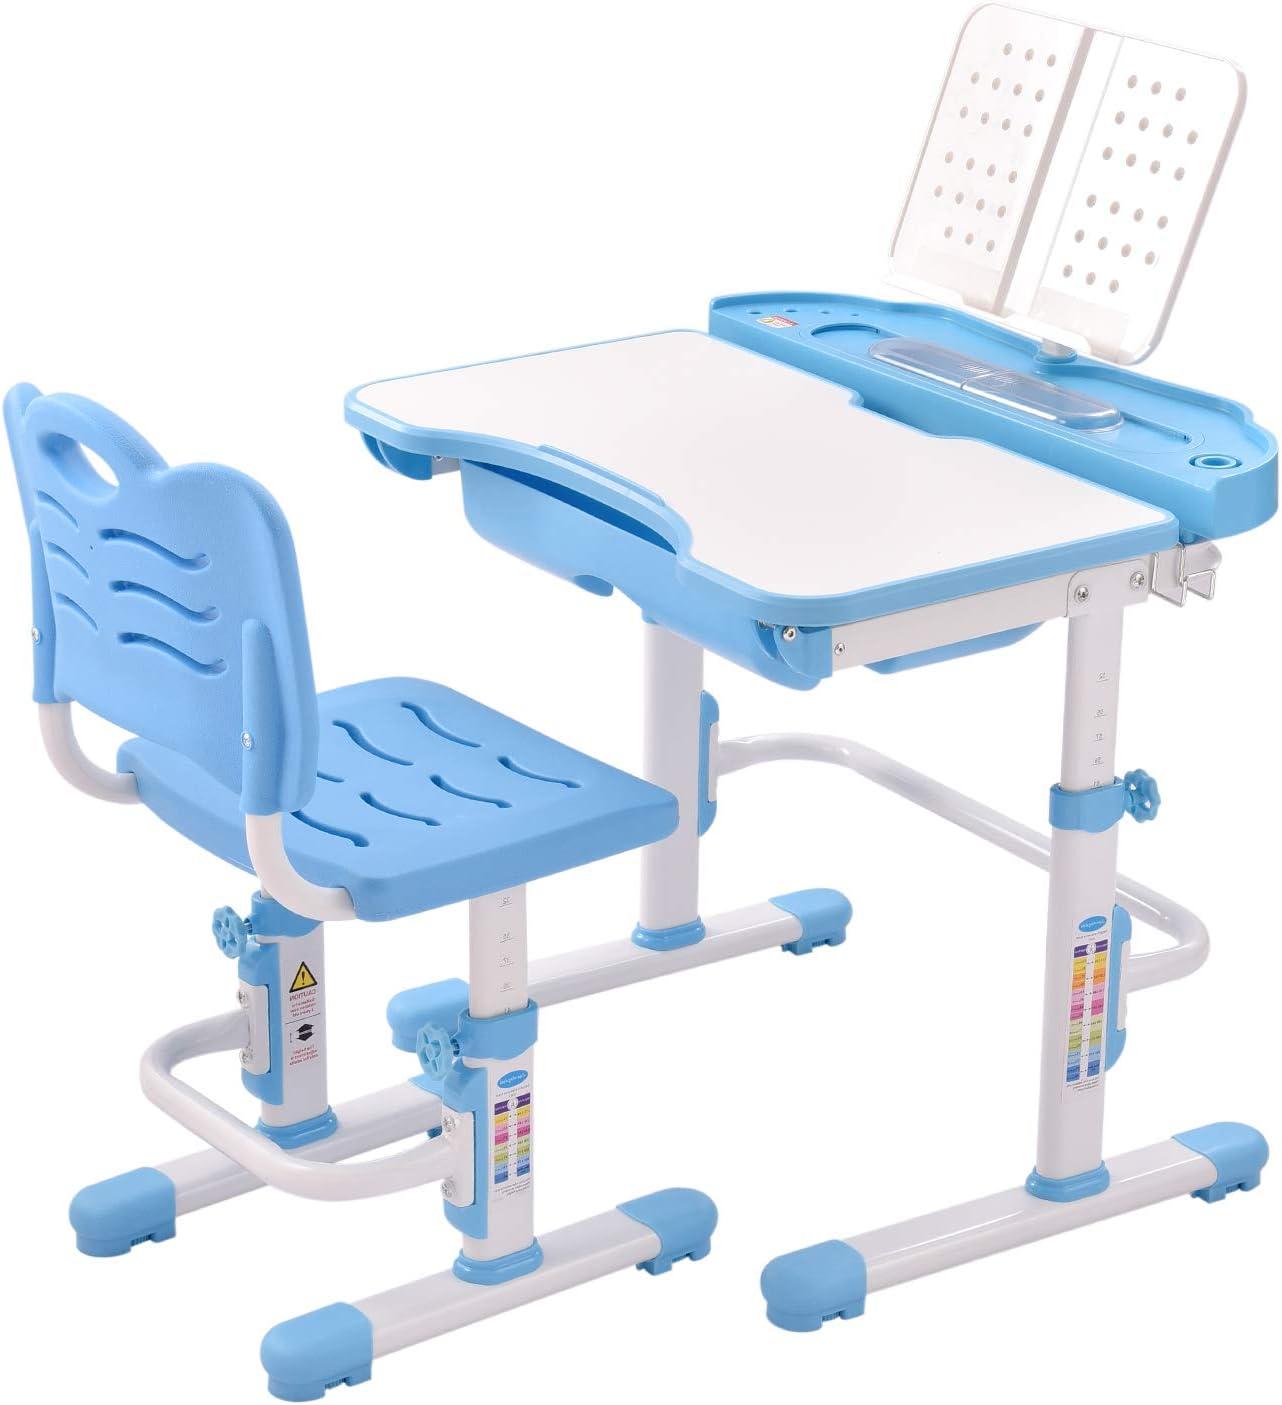 Children Study Desk, Height Adjustable Kids Table and Chair Set, Tilted Desktop, Pull Out Drawer Storage, Metal Hook, Multifunctional School Student Study Desk Chair.Light Gray/Blue/Pink. (Blue)